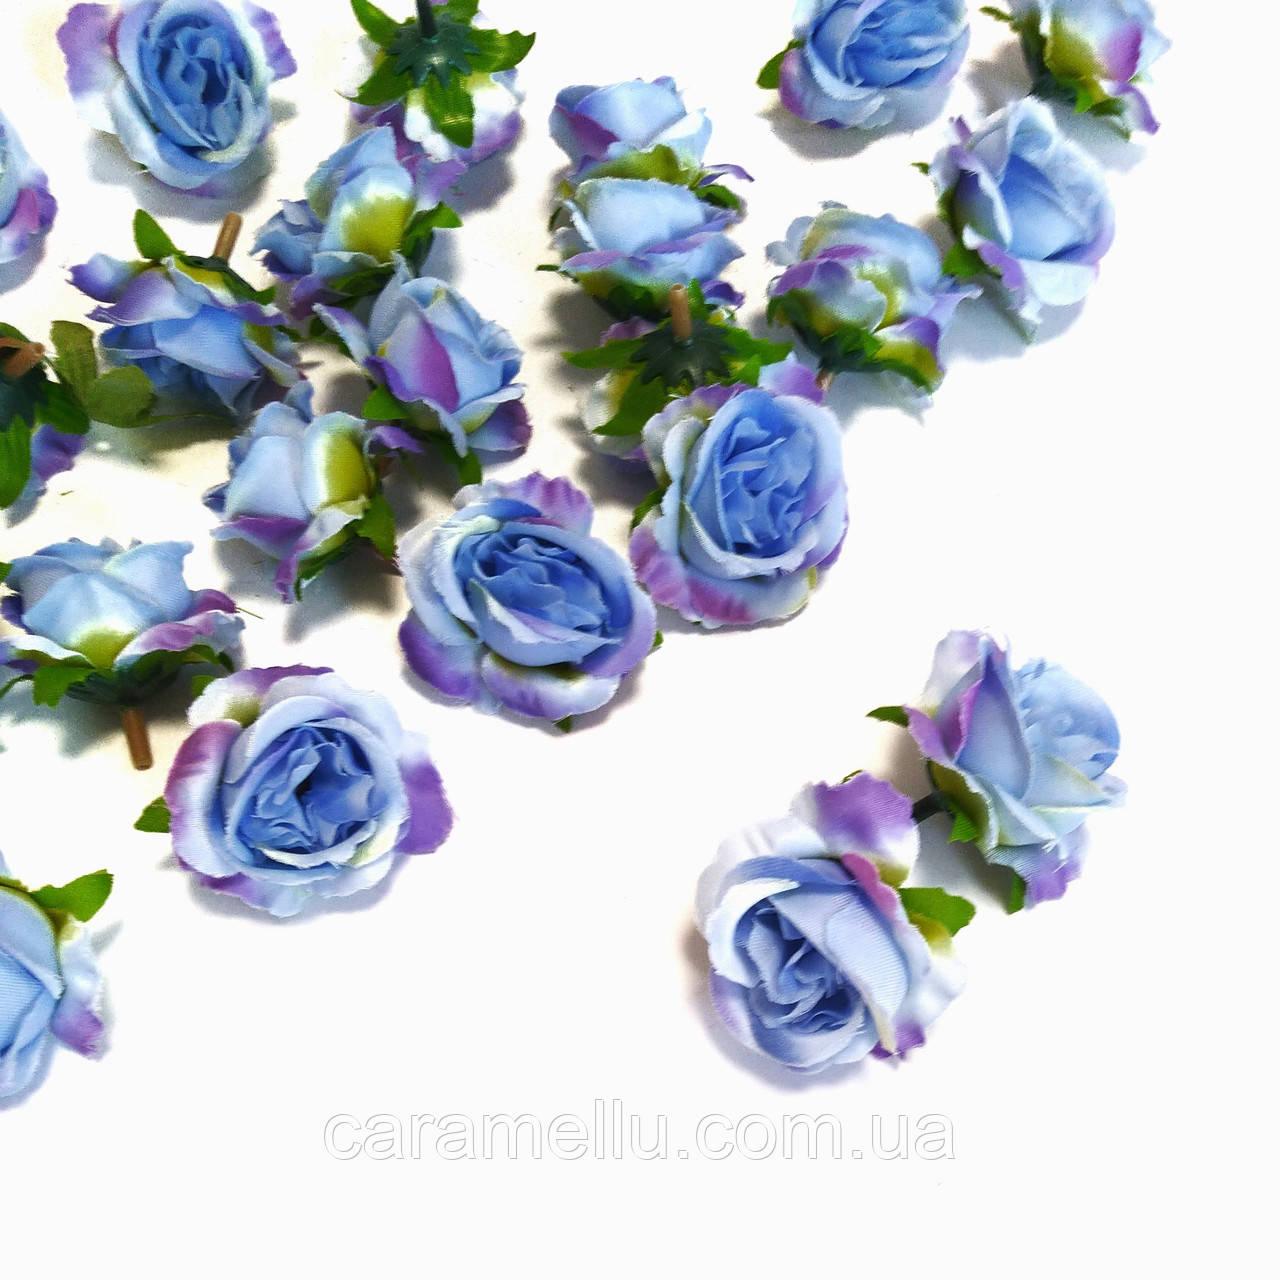 Розочка прованс.  4,5см. Цвет сиренево-голубой